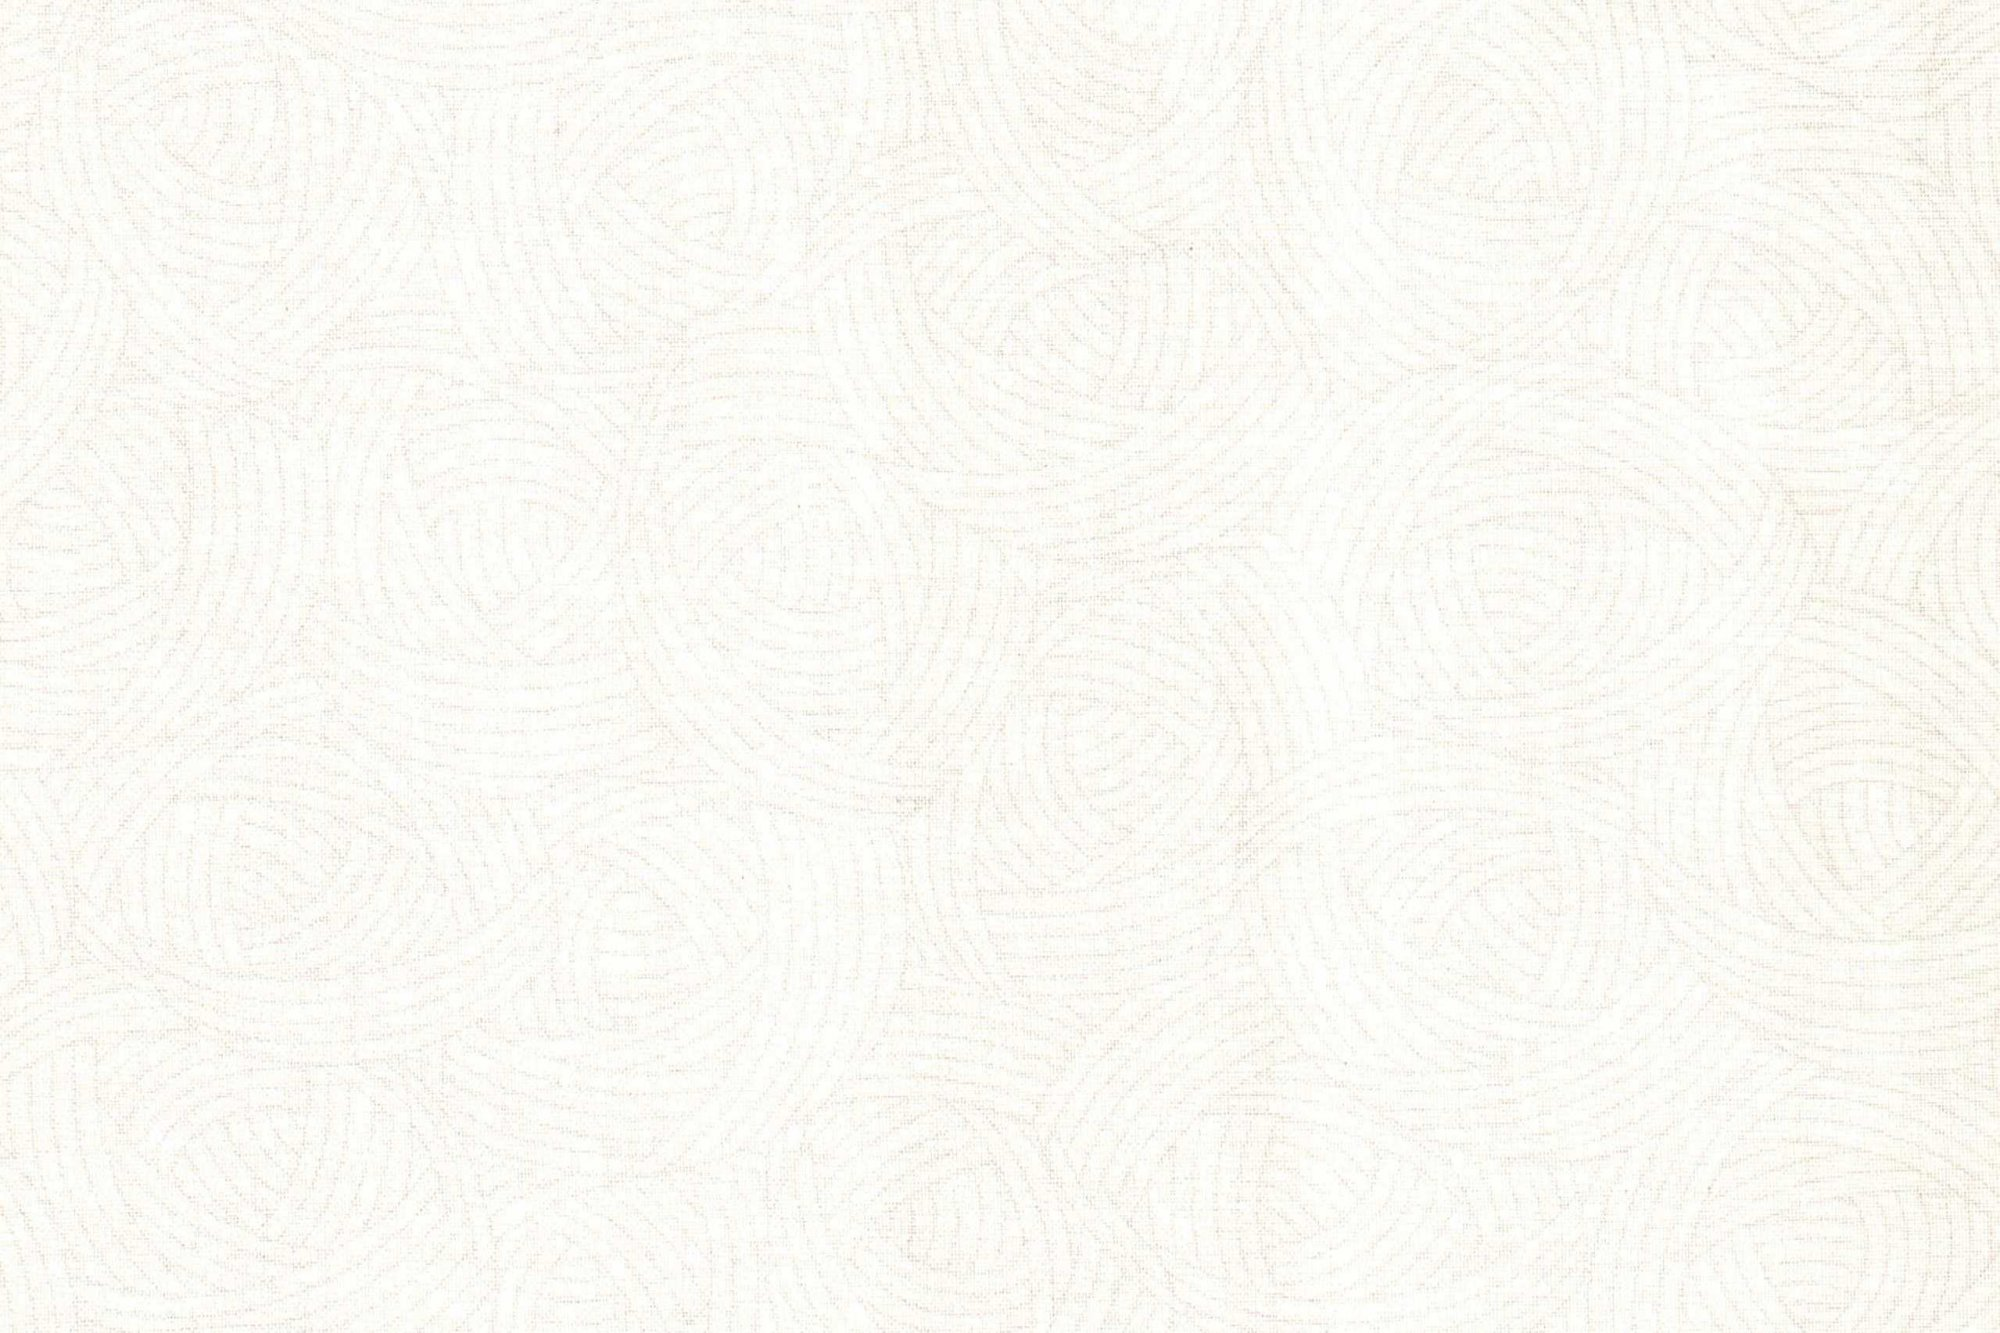 QUILTING TREASURES WHITE LOLA TEXTURES 1649-22926 Z